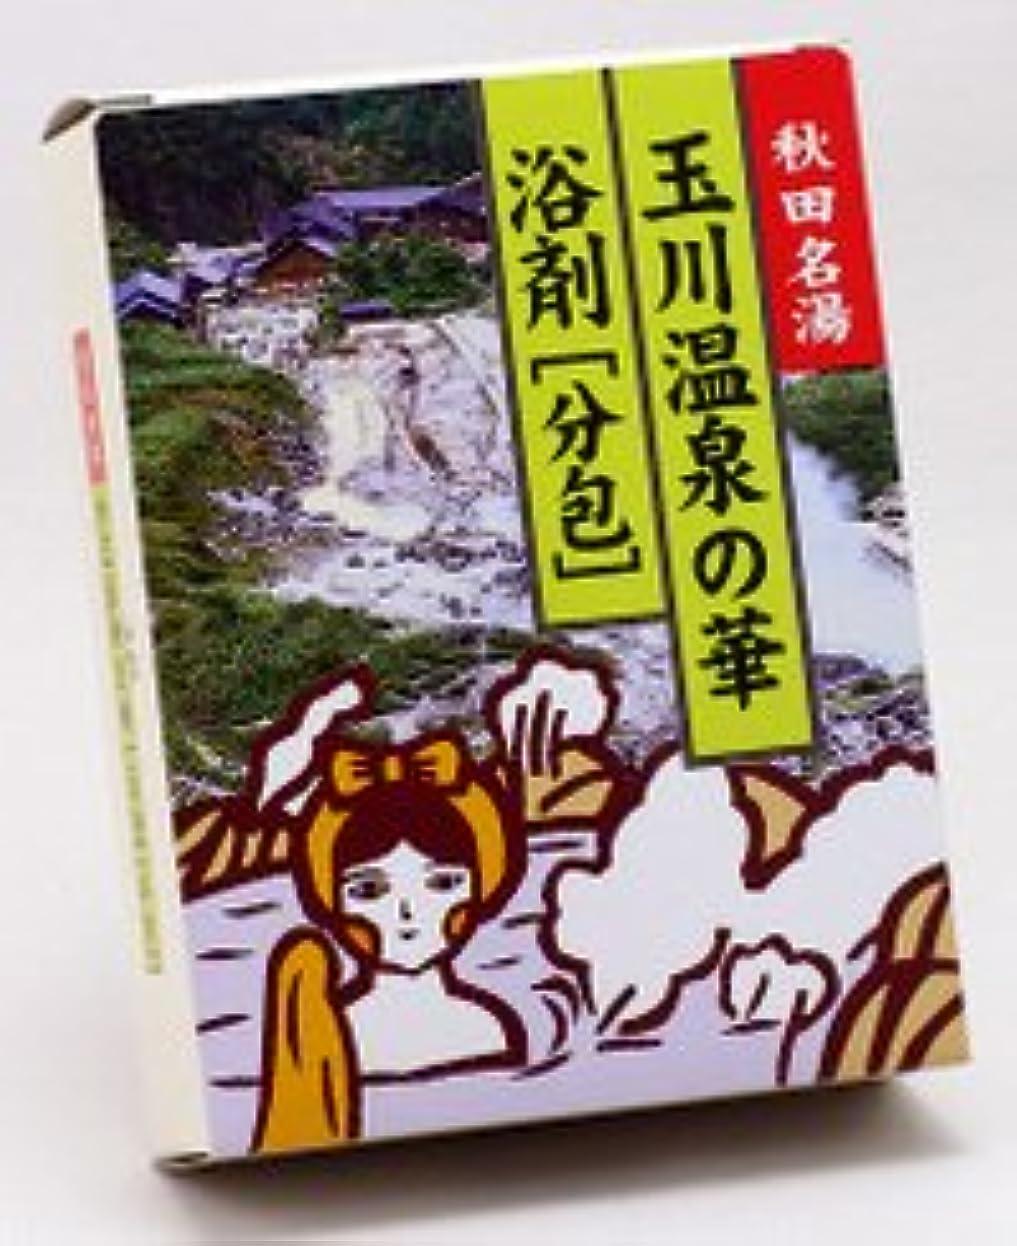 所有権谷甘い入浴剤 玉川温泉の華